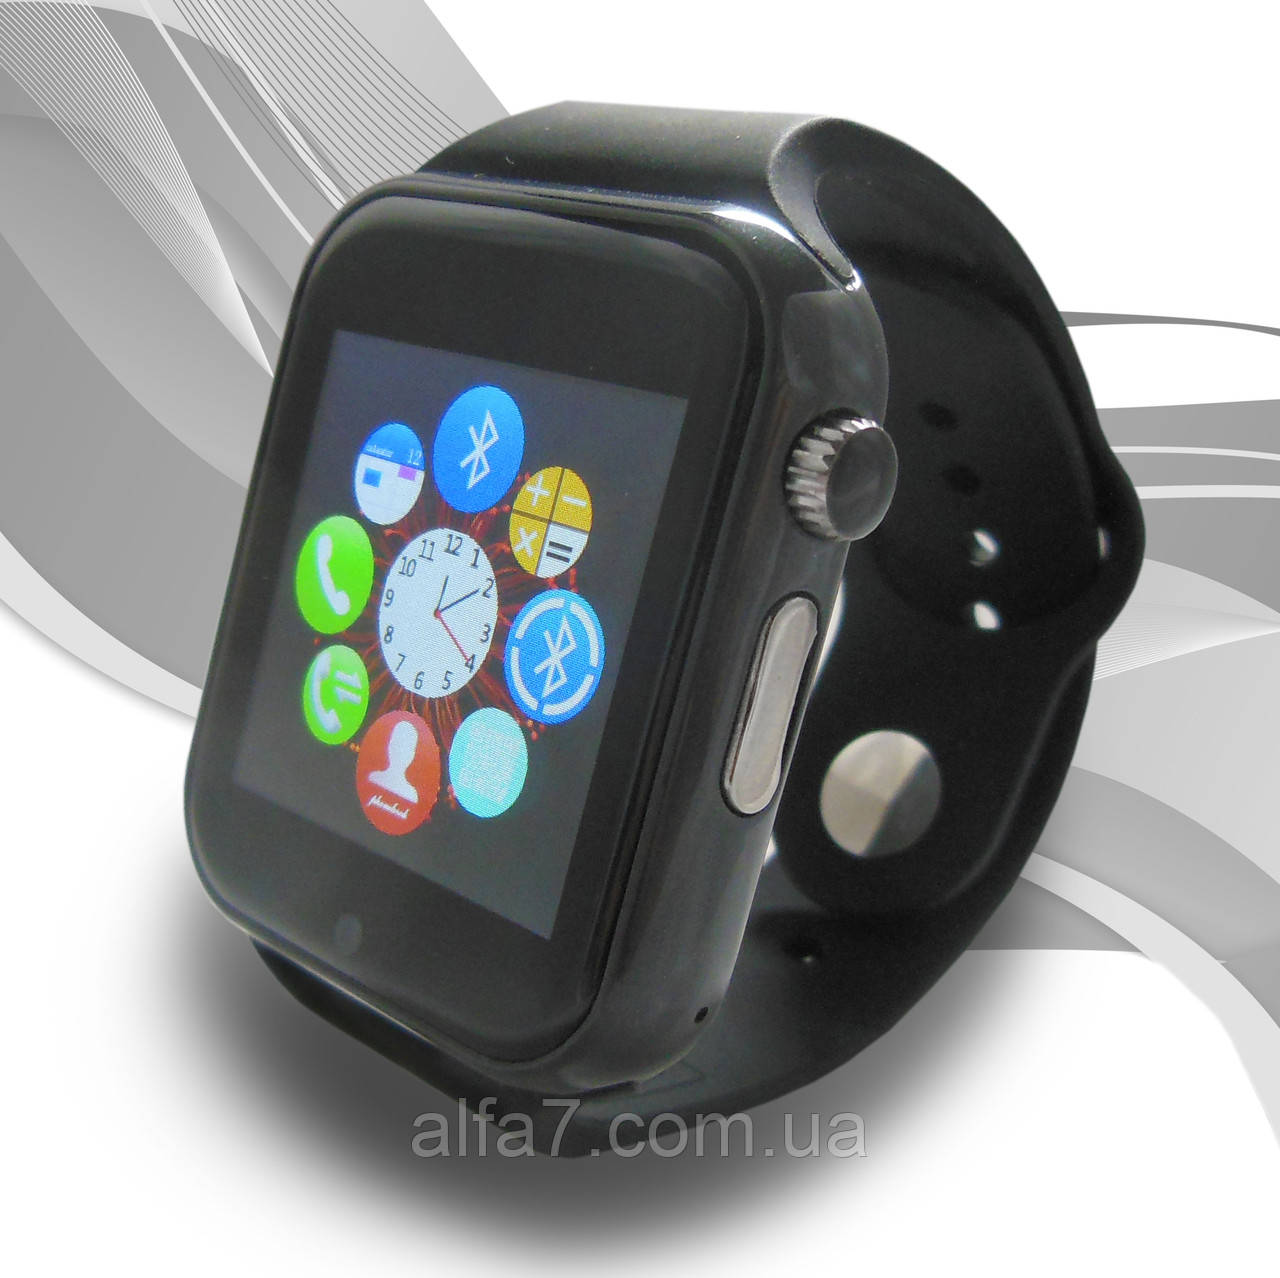 Что такое умные часы apple